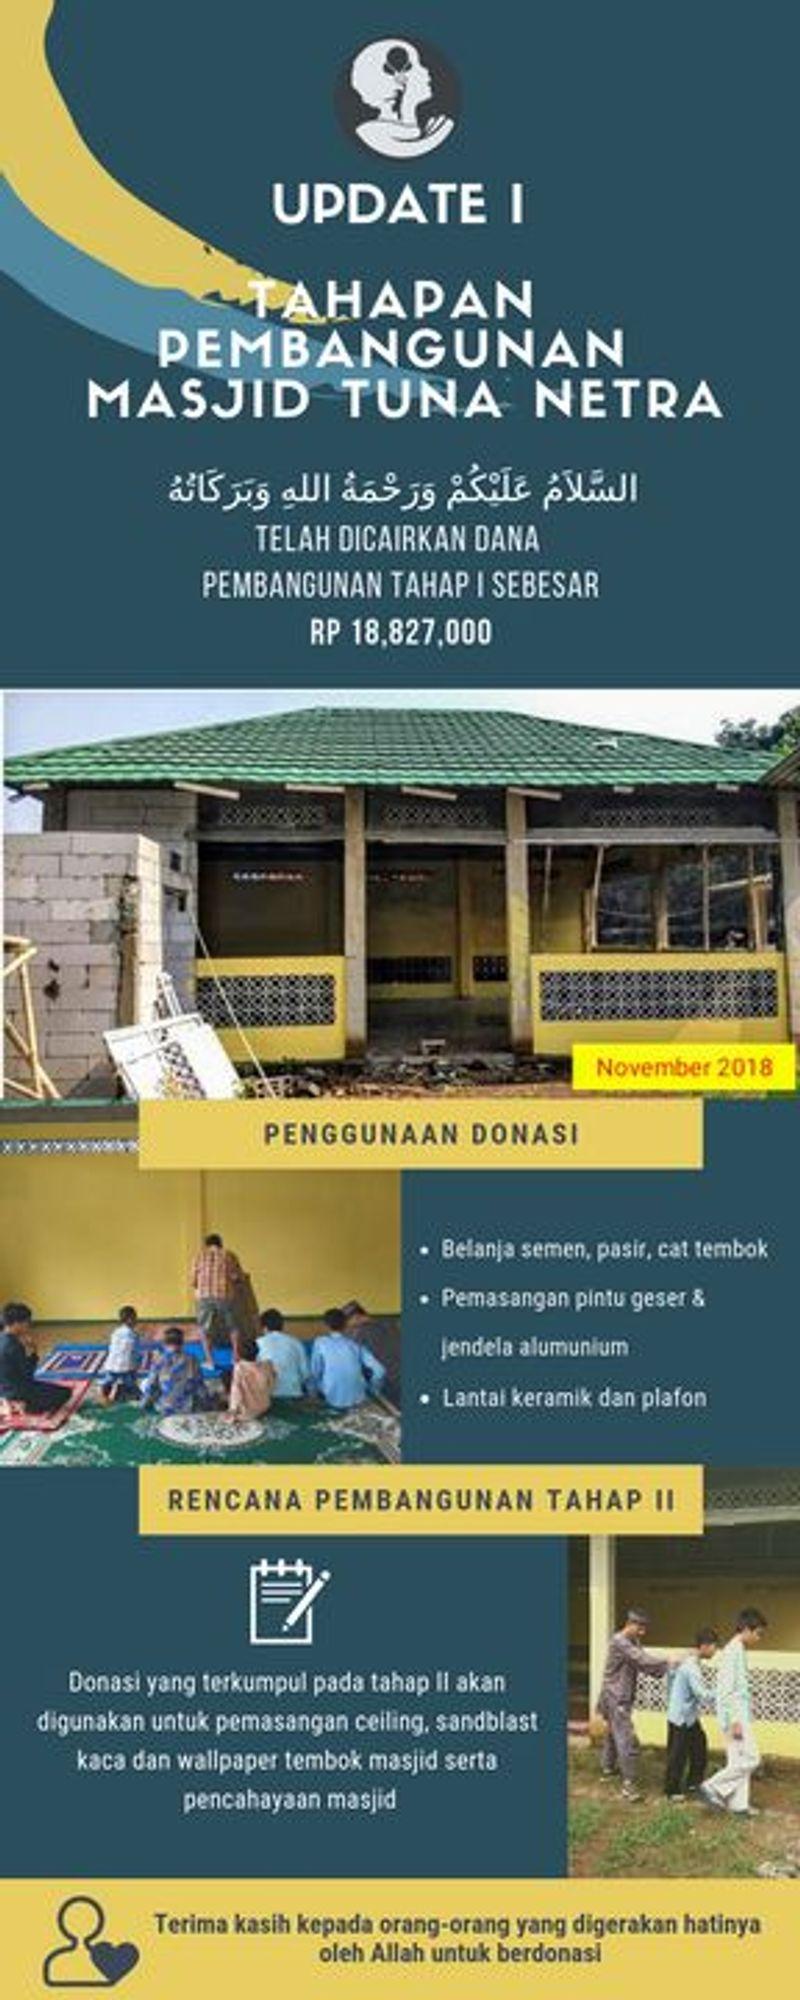 Update Tahap I Pembangunan Masjid Tuna Netra